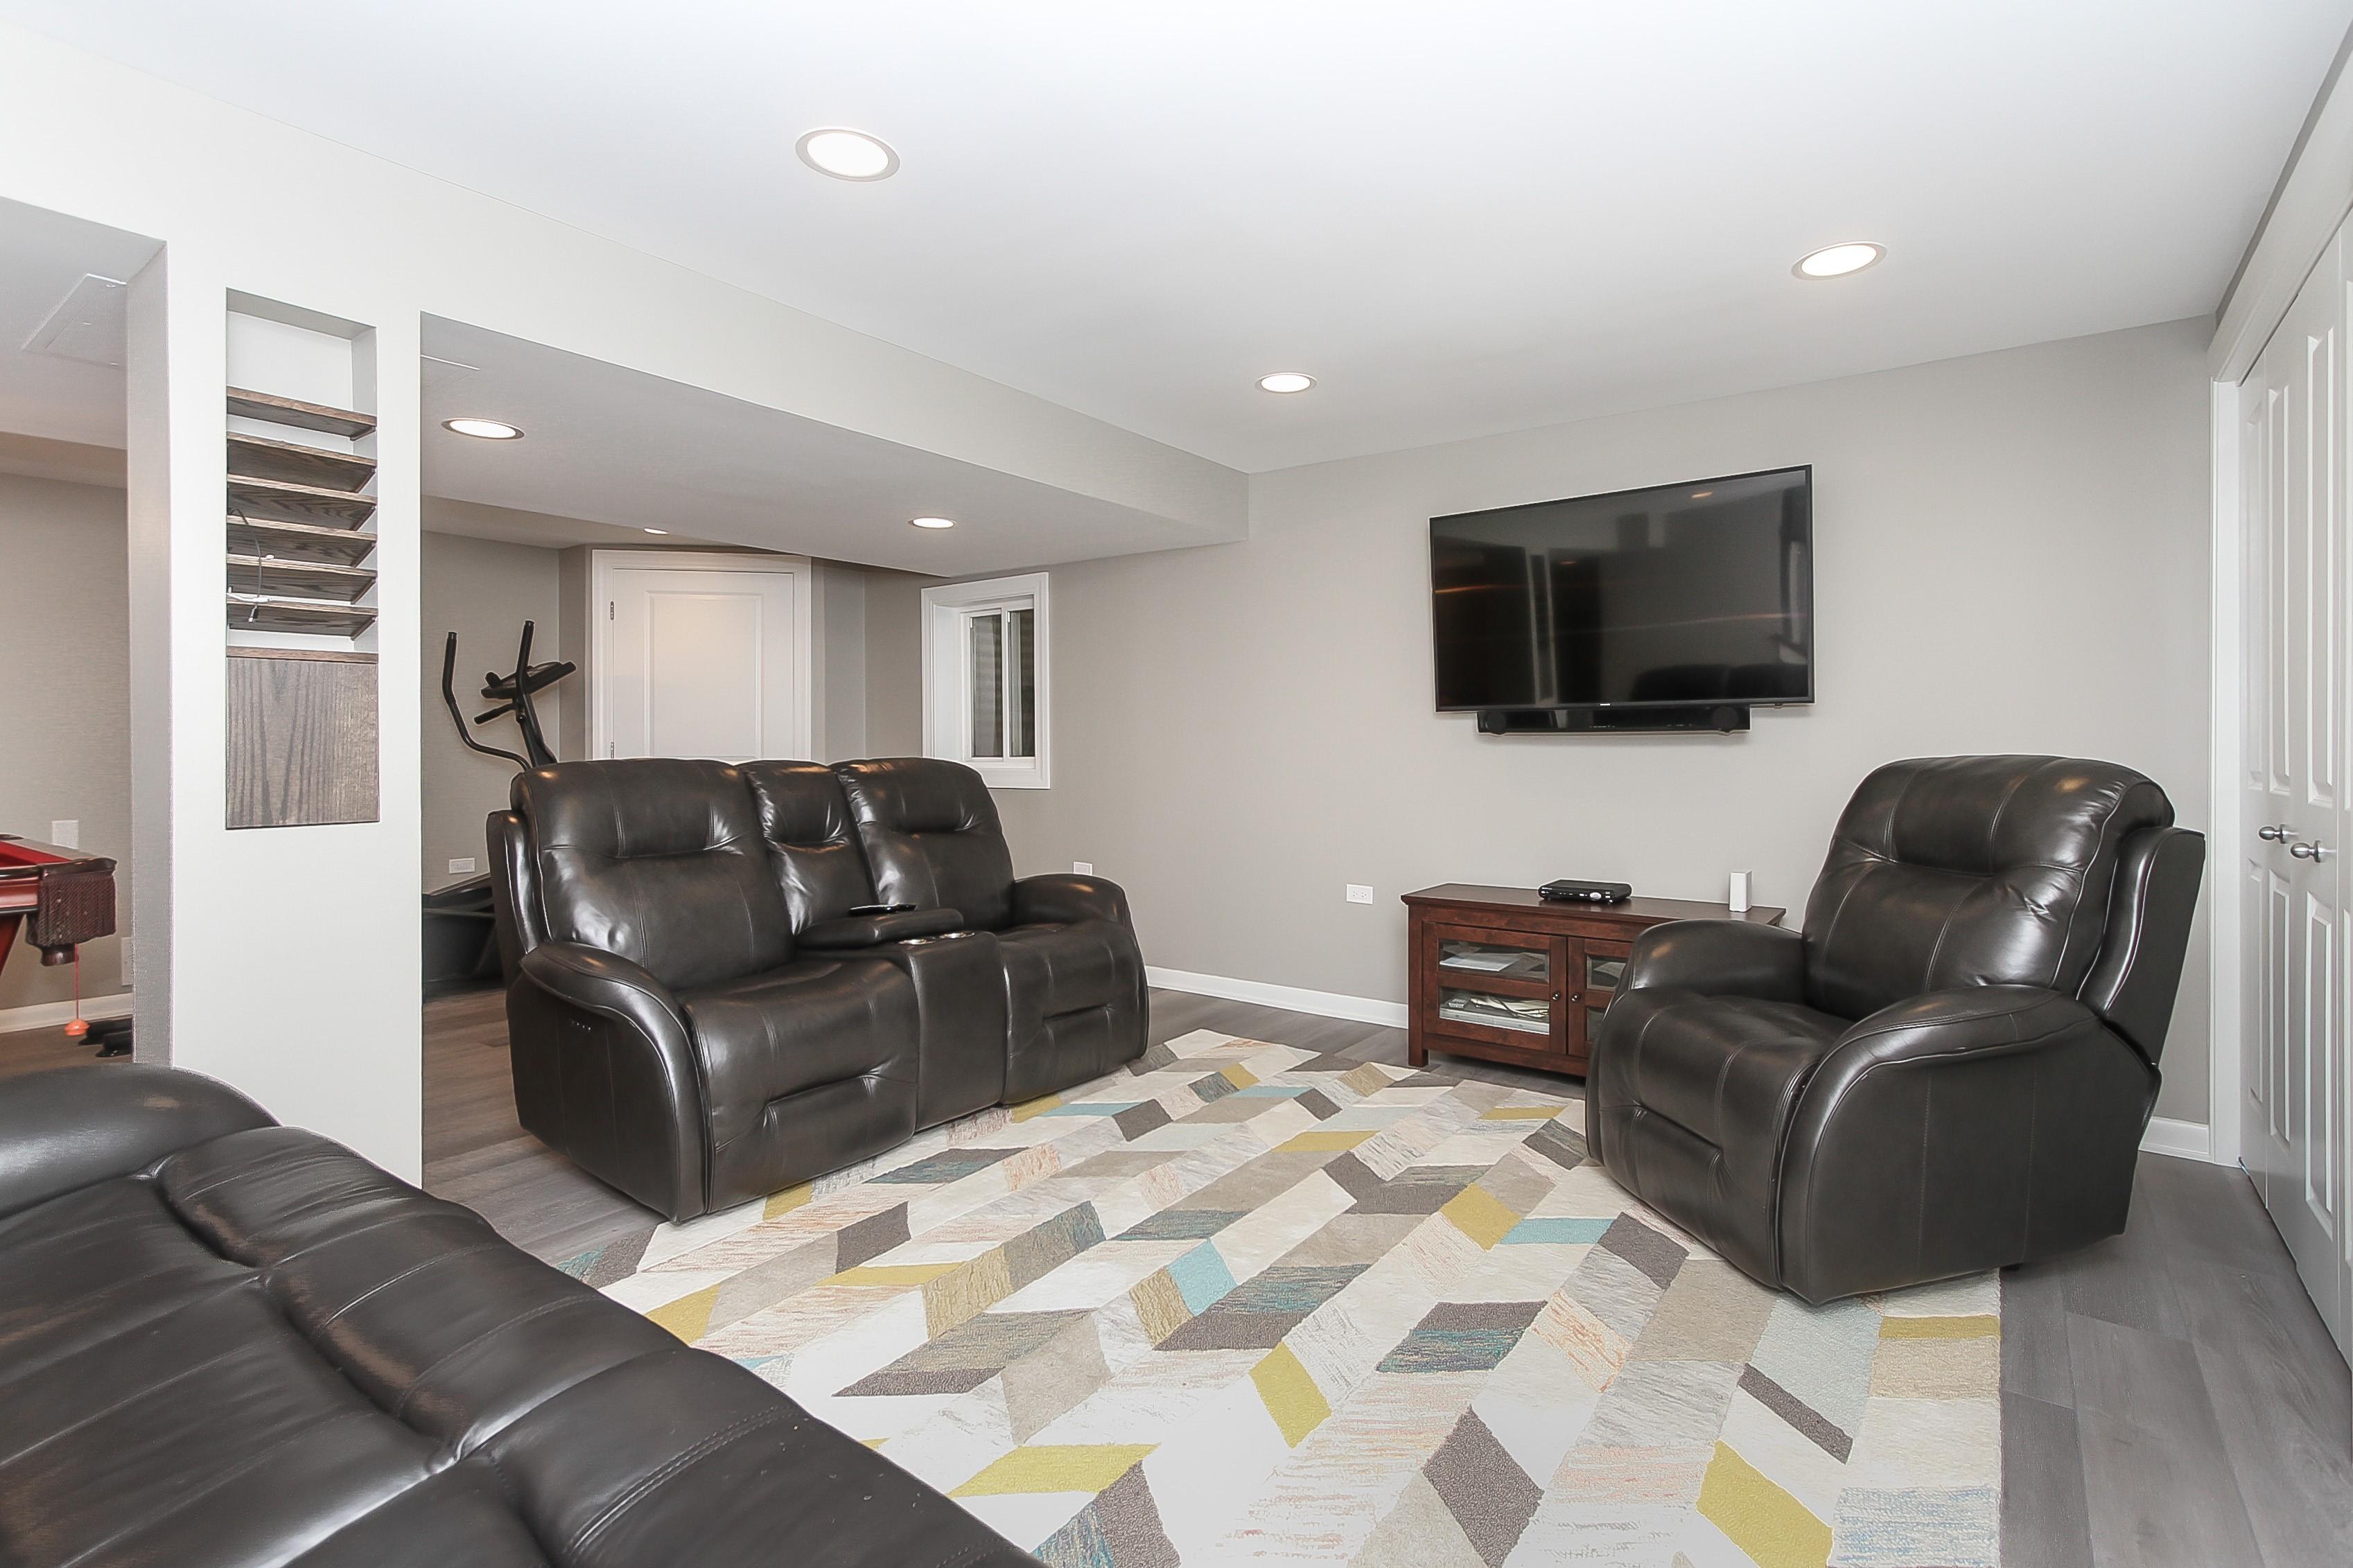 Transitional-Basement-Remodel-Arlington-Heights-Illinois